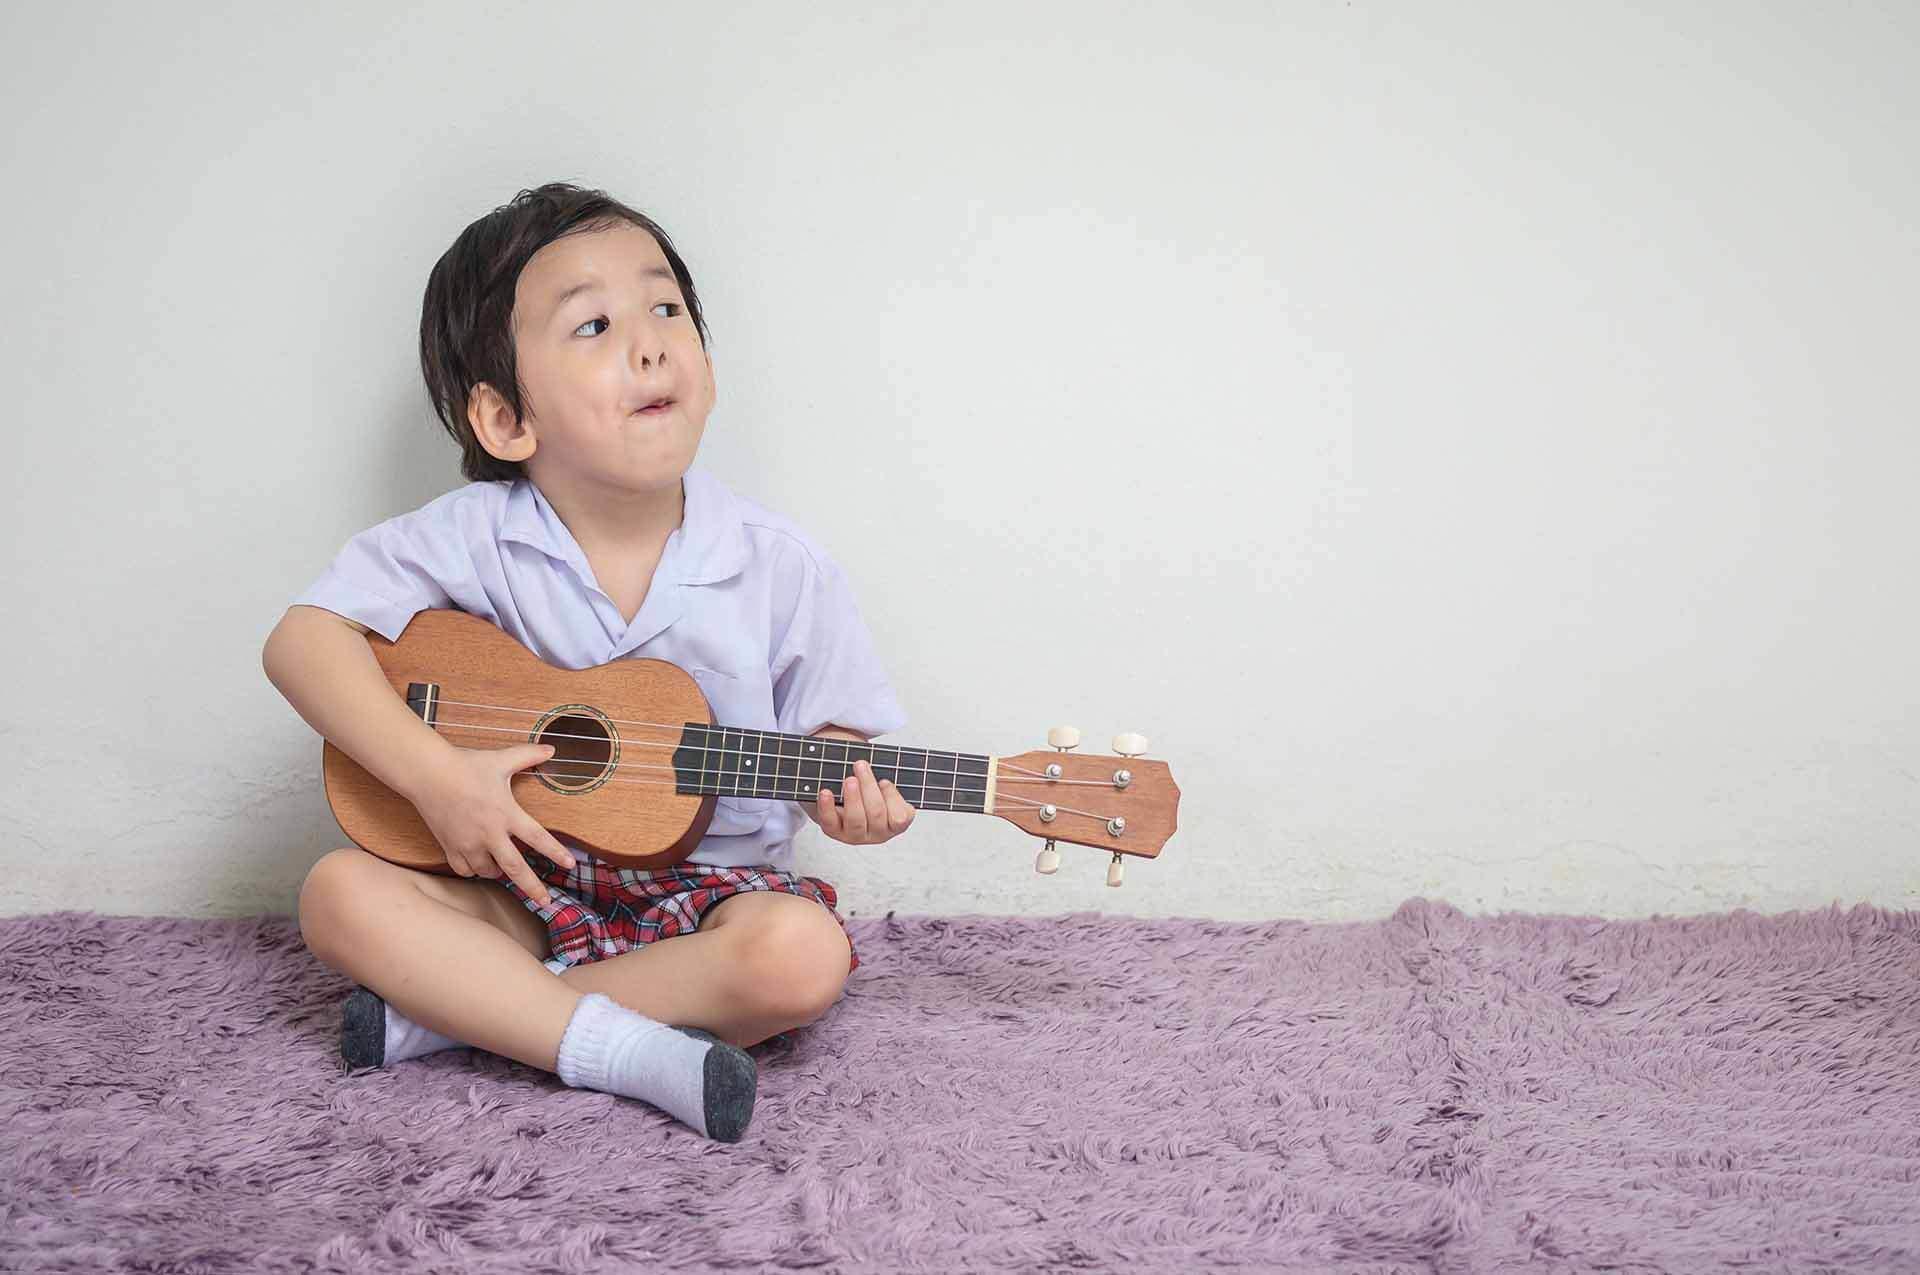 How to Choose the Best Kids Ukulele